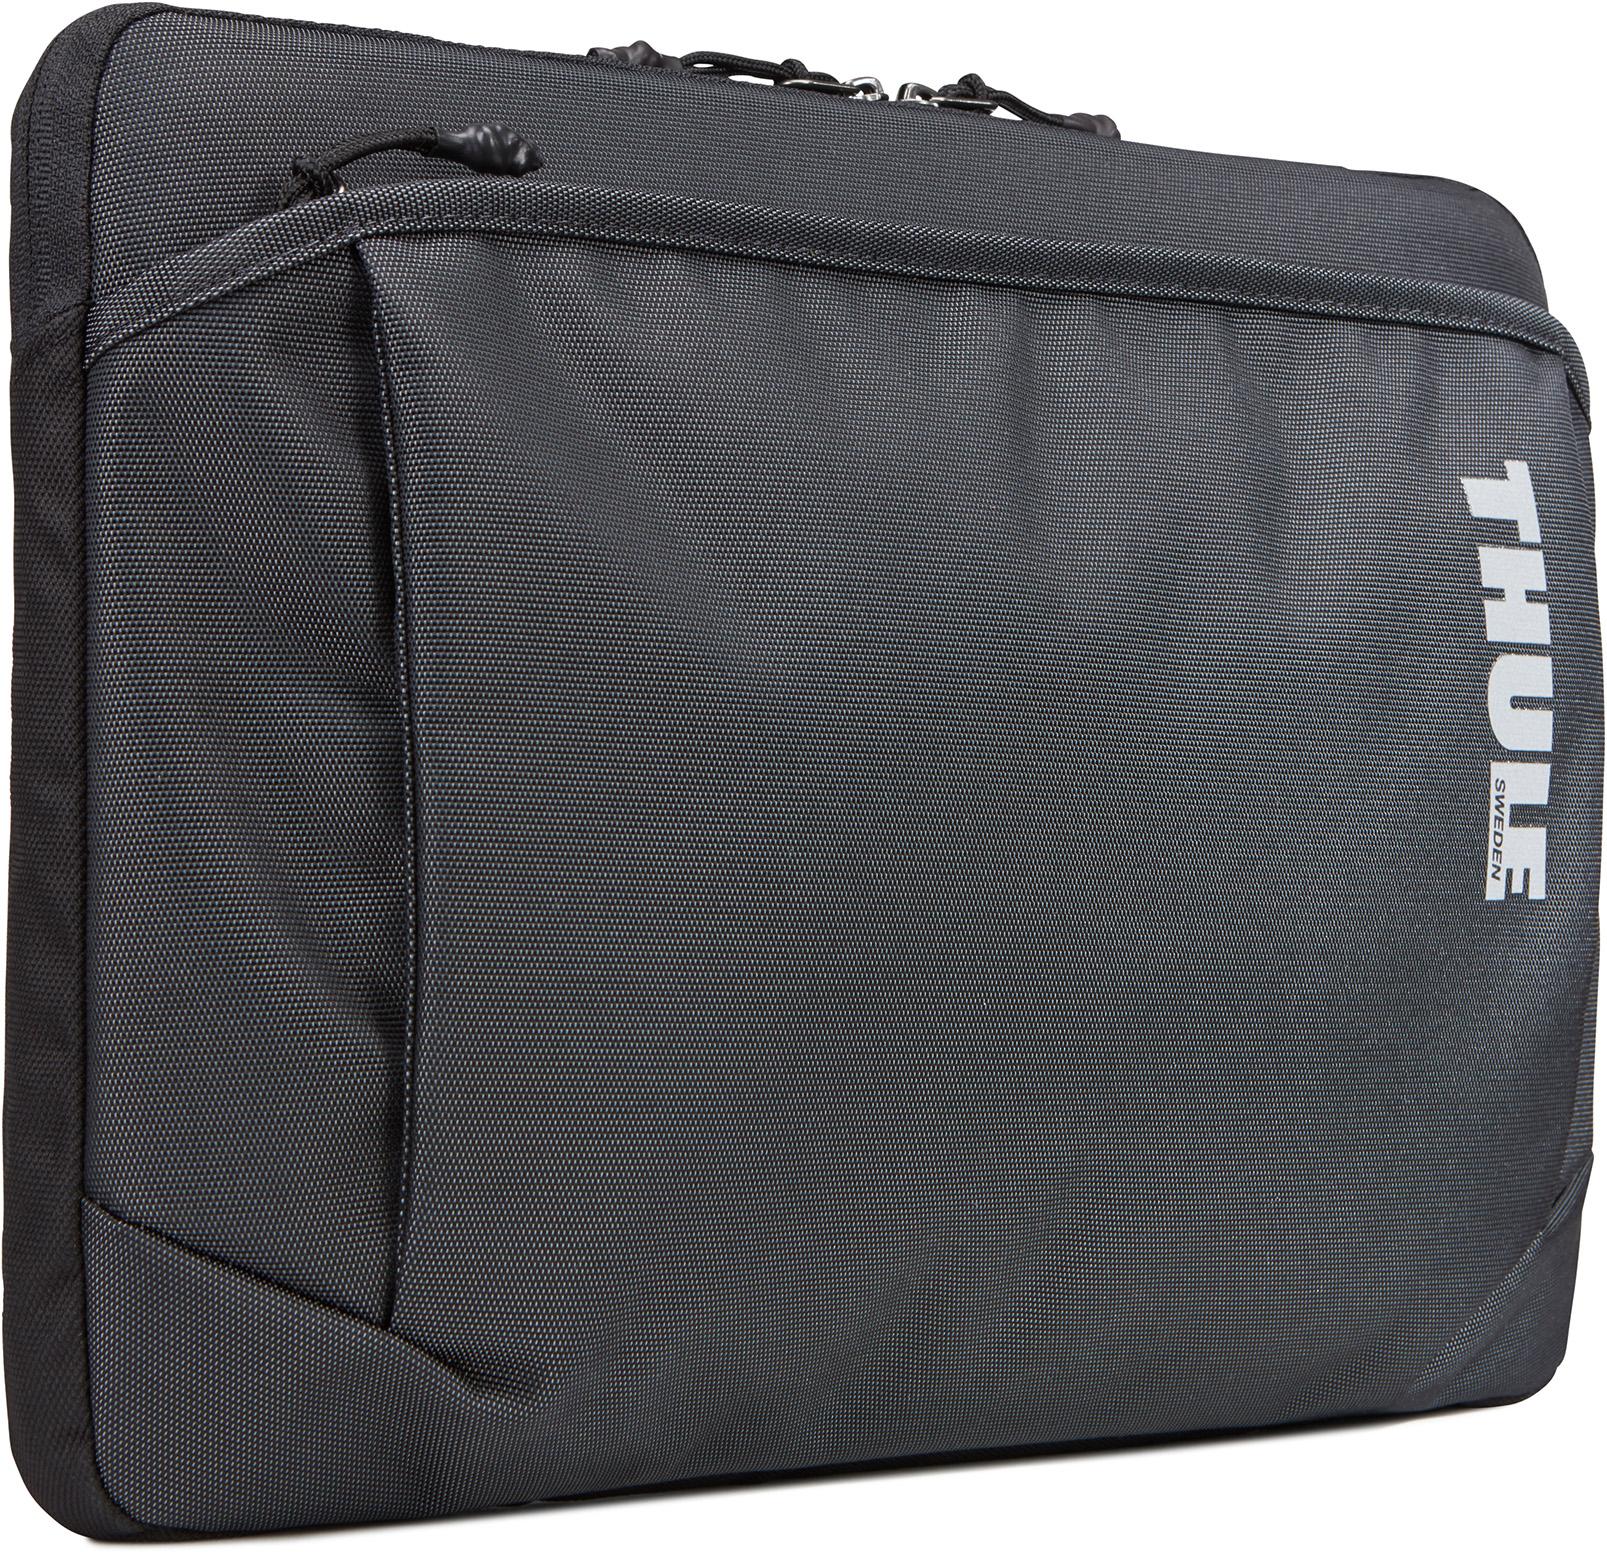 Thule Subterra 15-Inch Laptop Sleeve